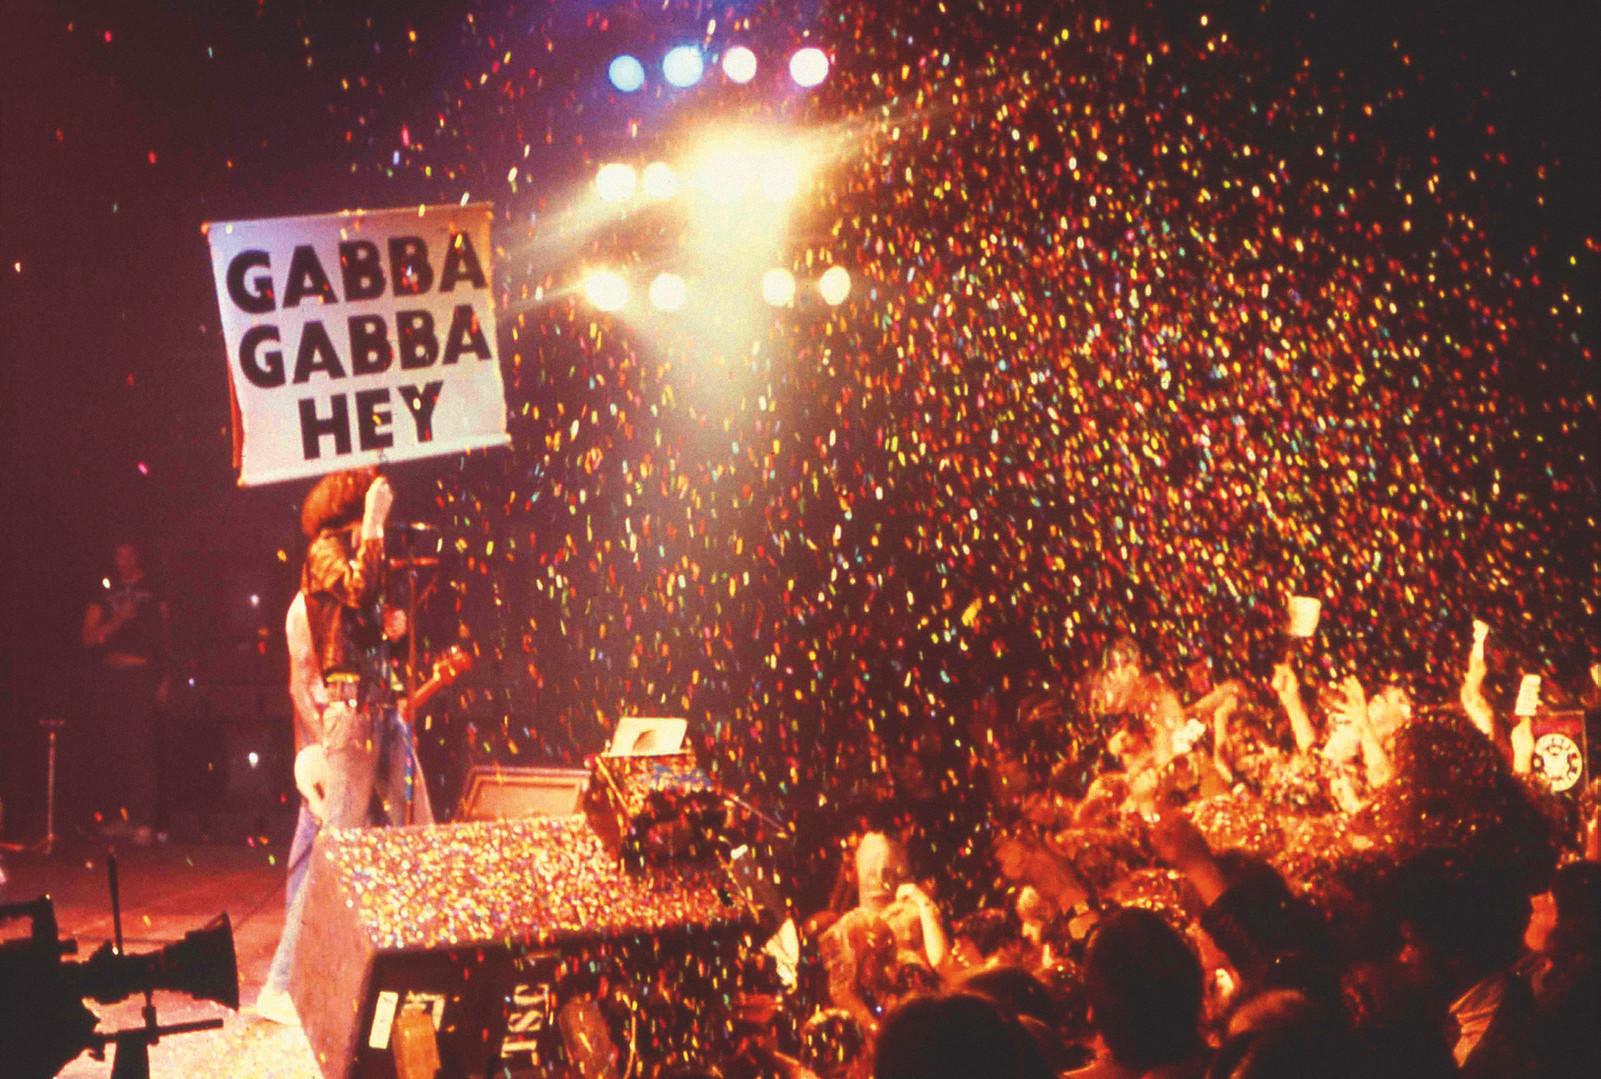 Ramones Gabb Gabba Hey. London, UK - 1977